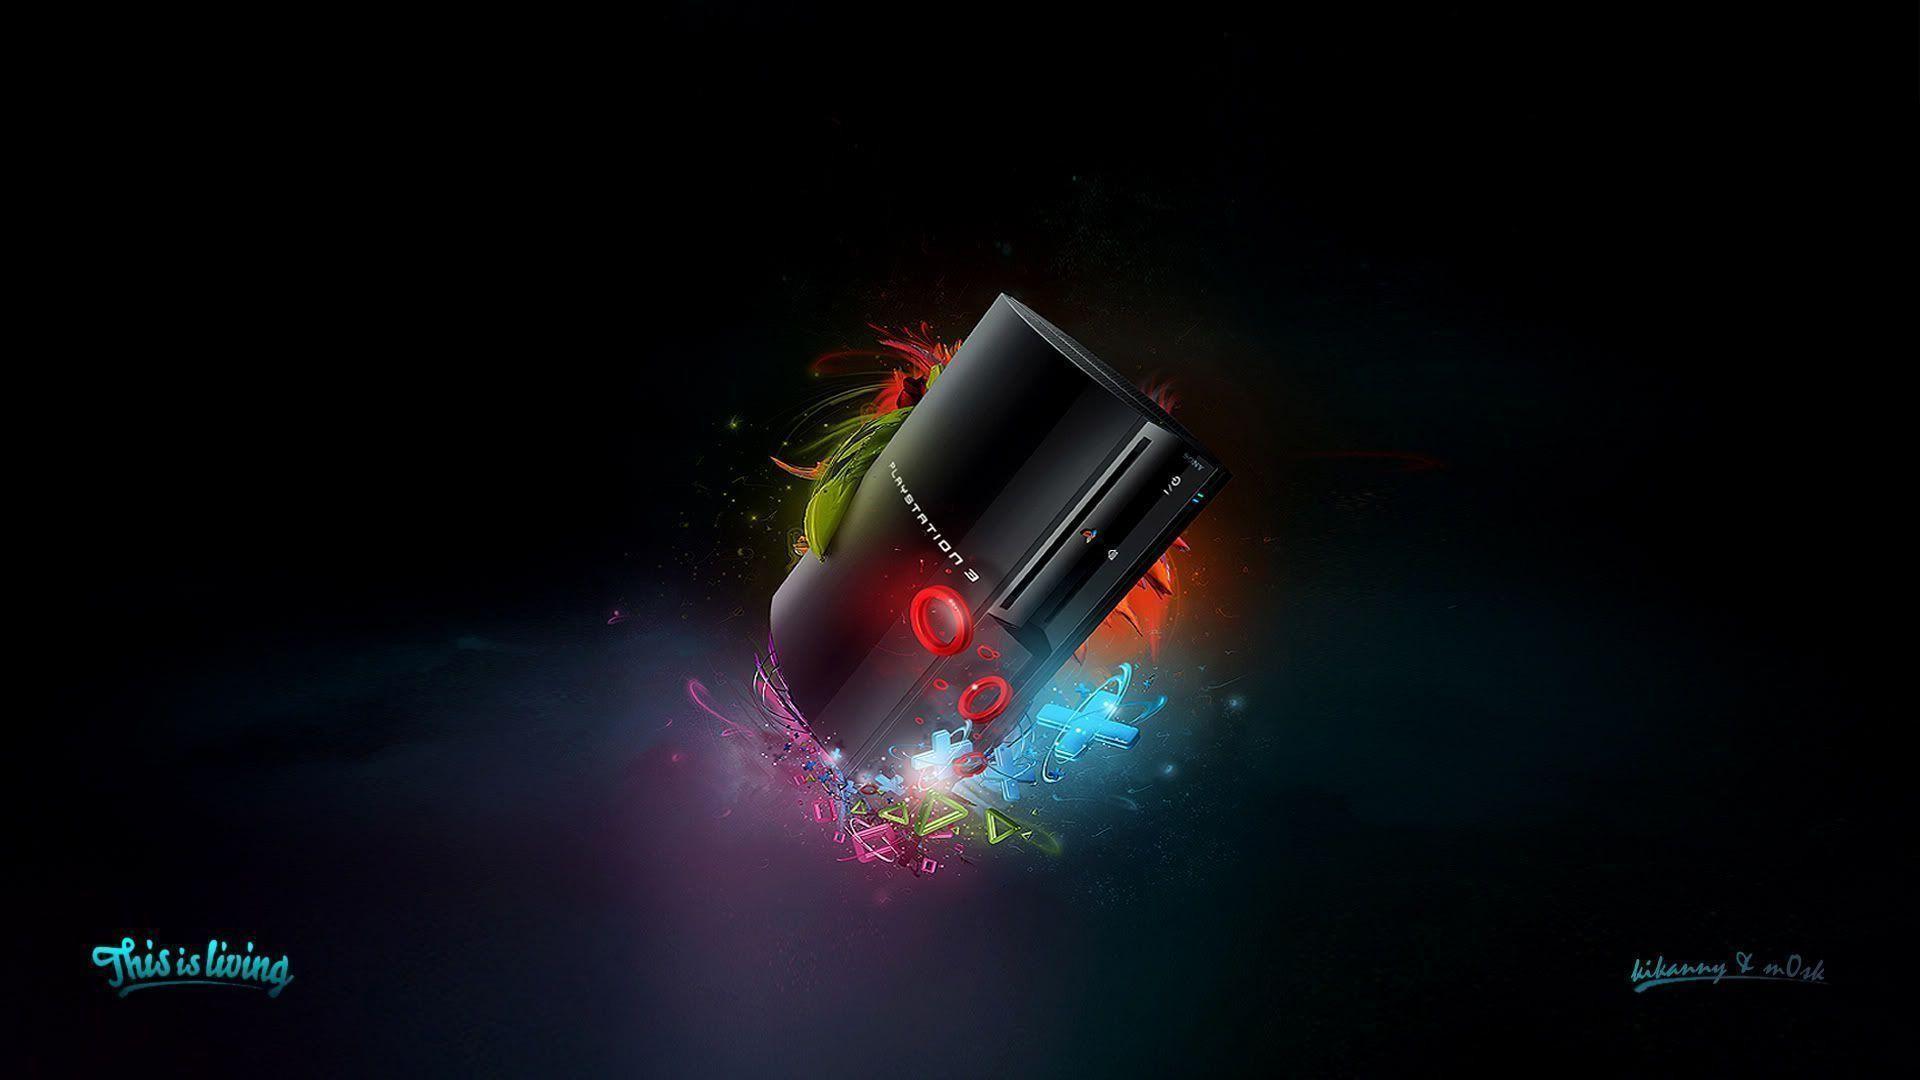 PlayStation 4 Wallpaper HD – WallpaperSafari